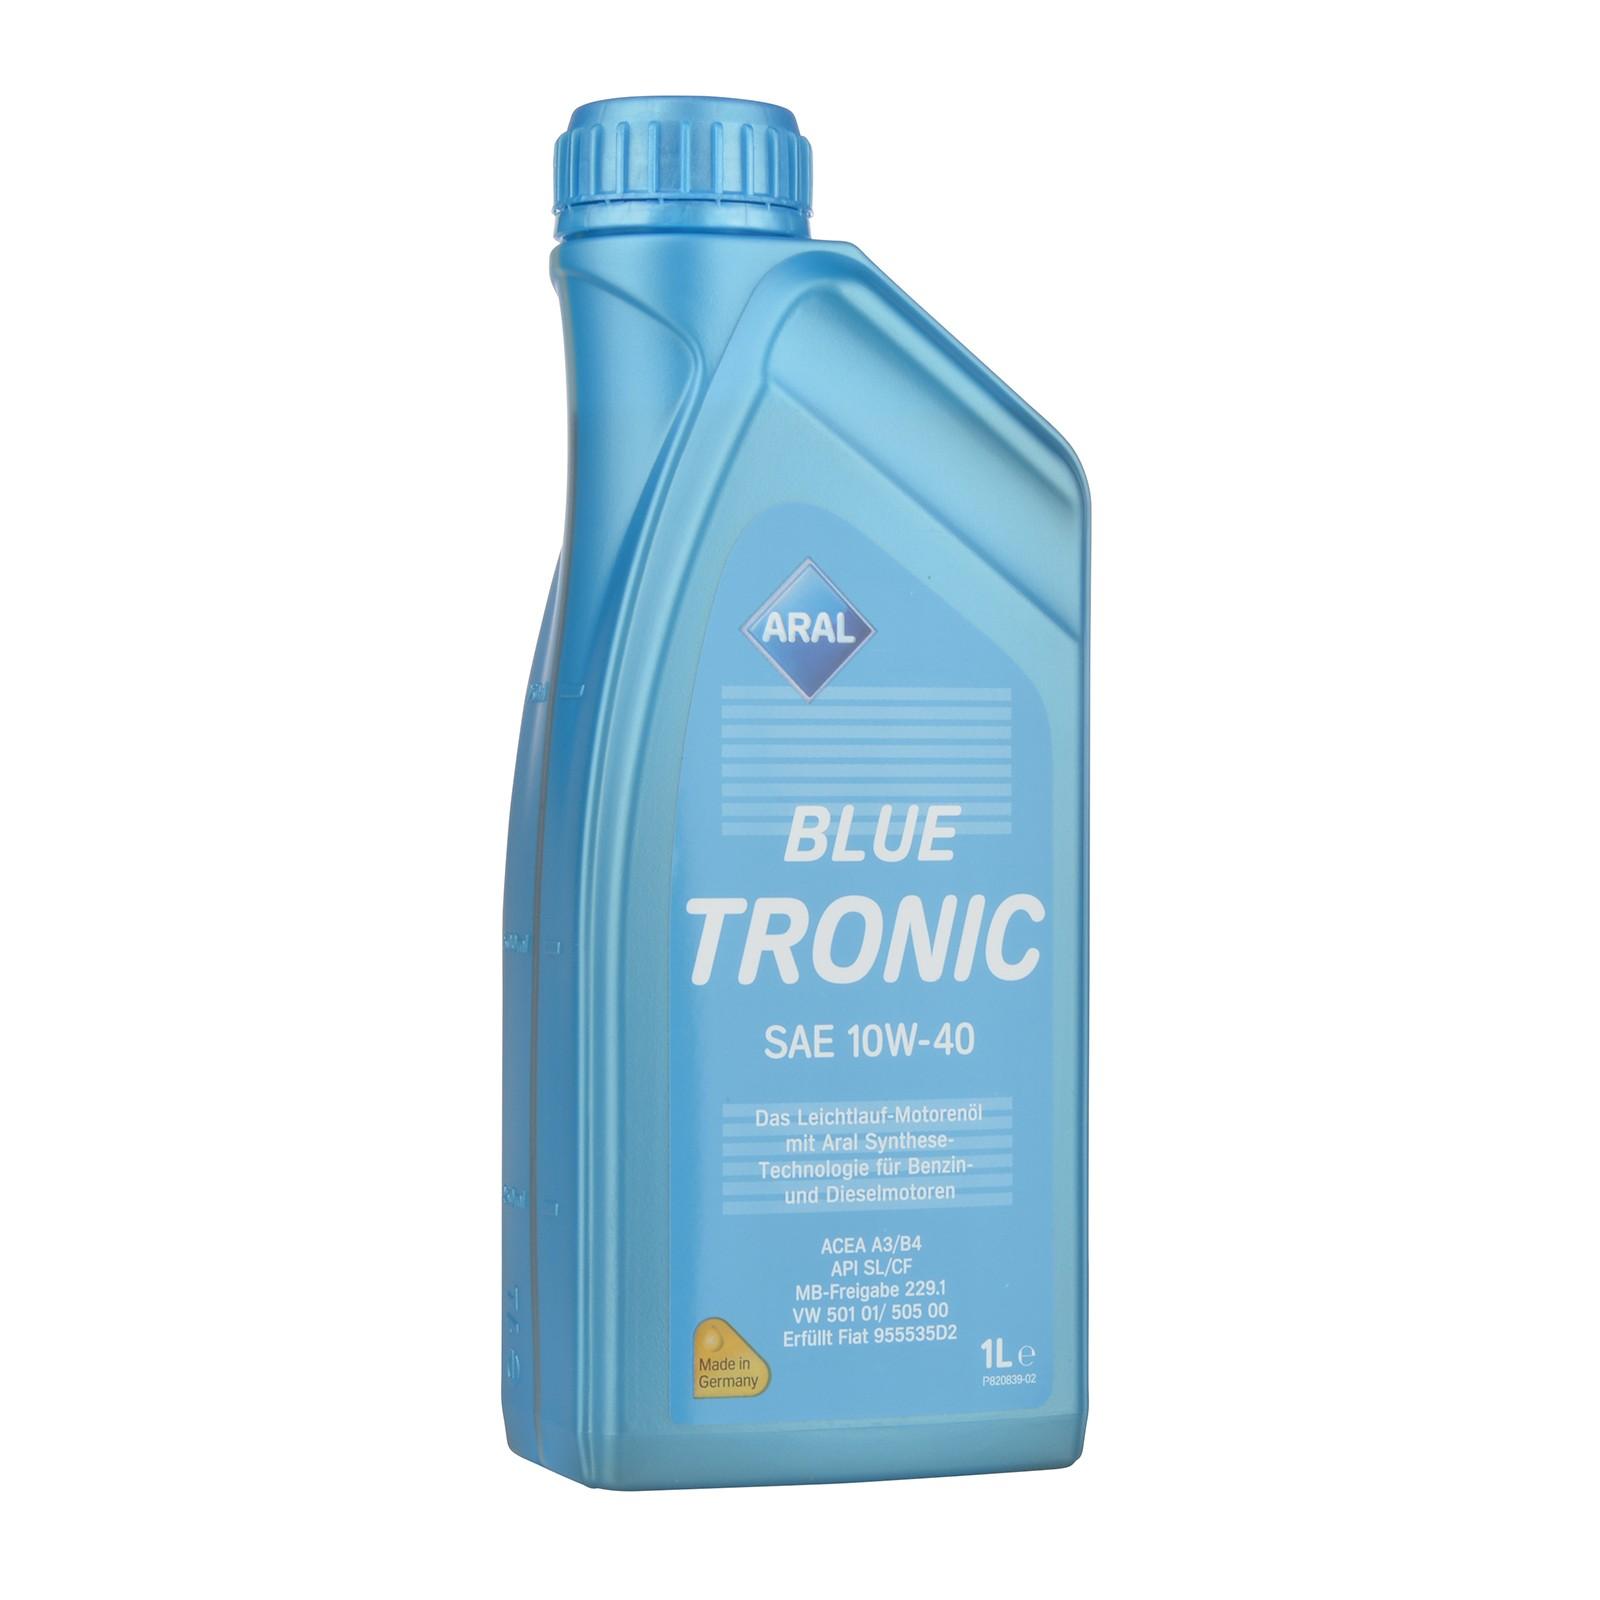 Aral BlueTronic 10W-40 - 1 Liter – Bild 1